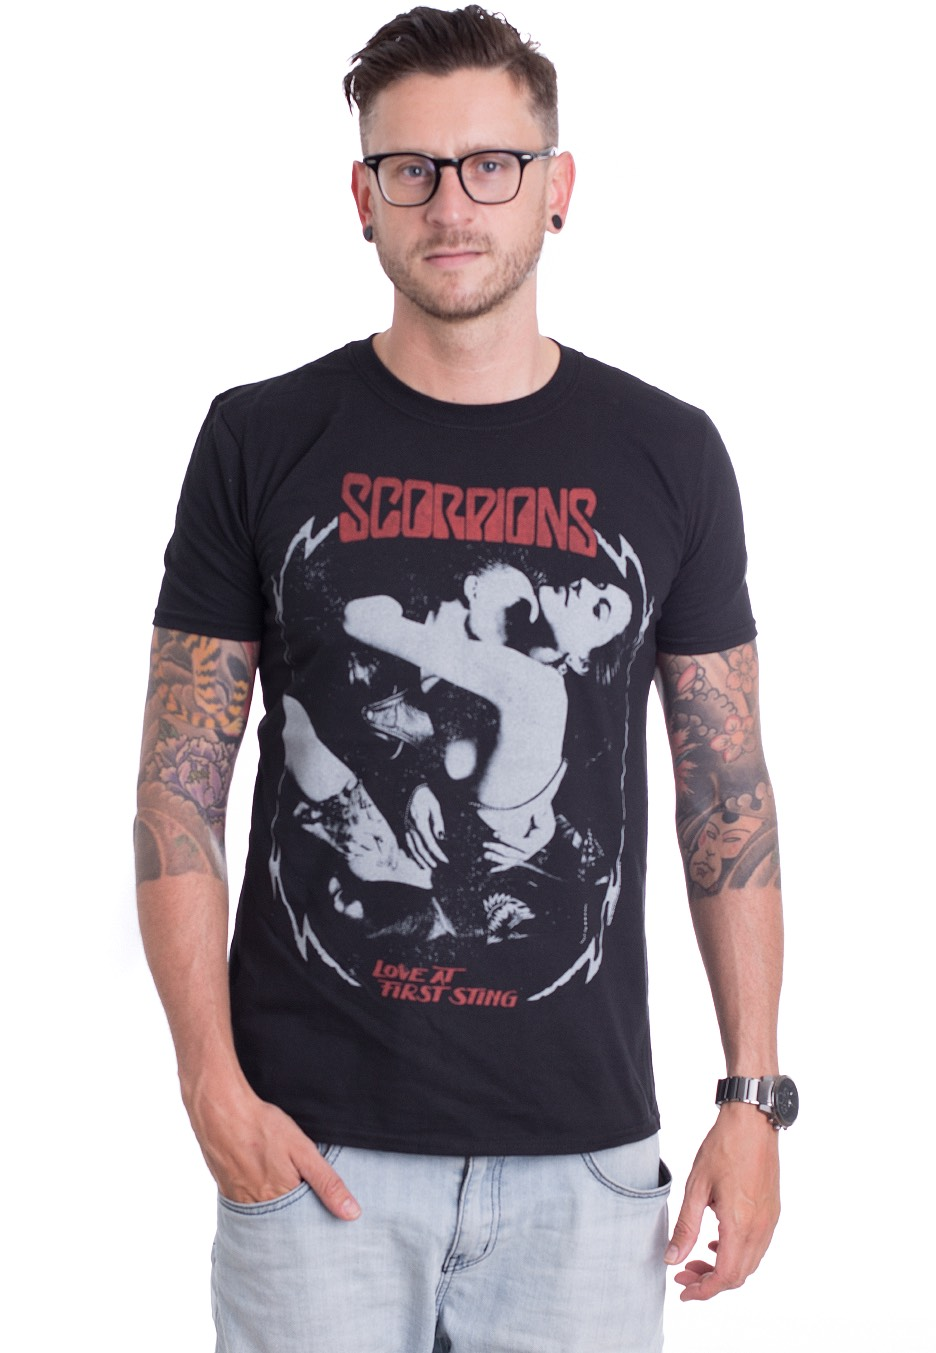 Scorpions T Shirt Love Drive Album Cover Band Logo Official Mens New Black